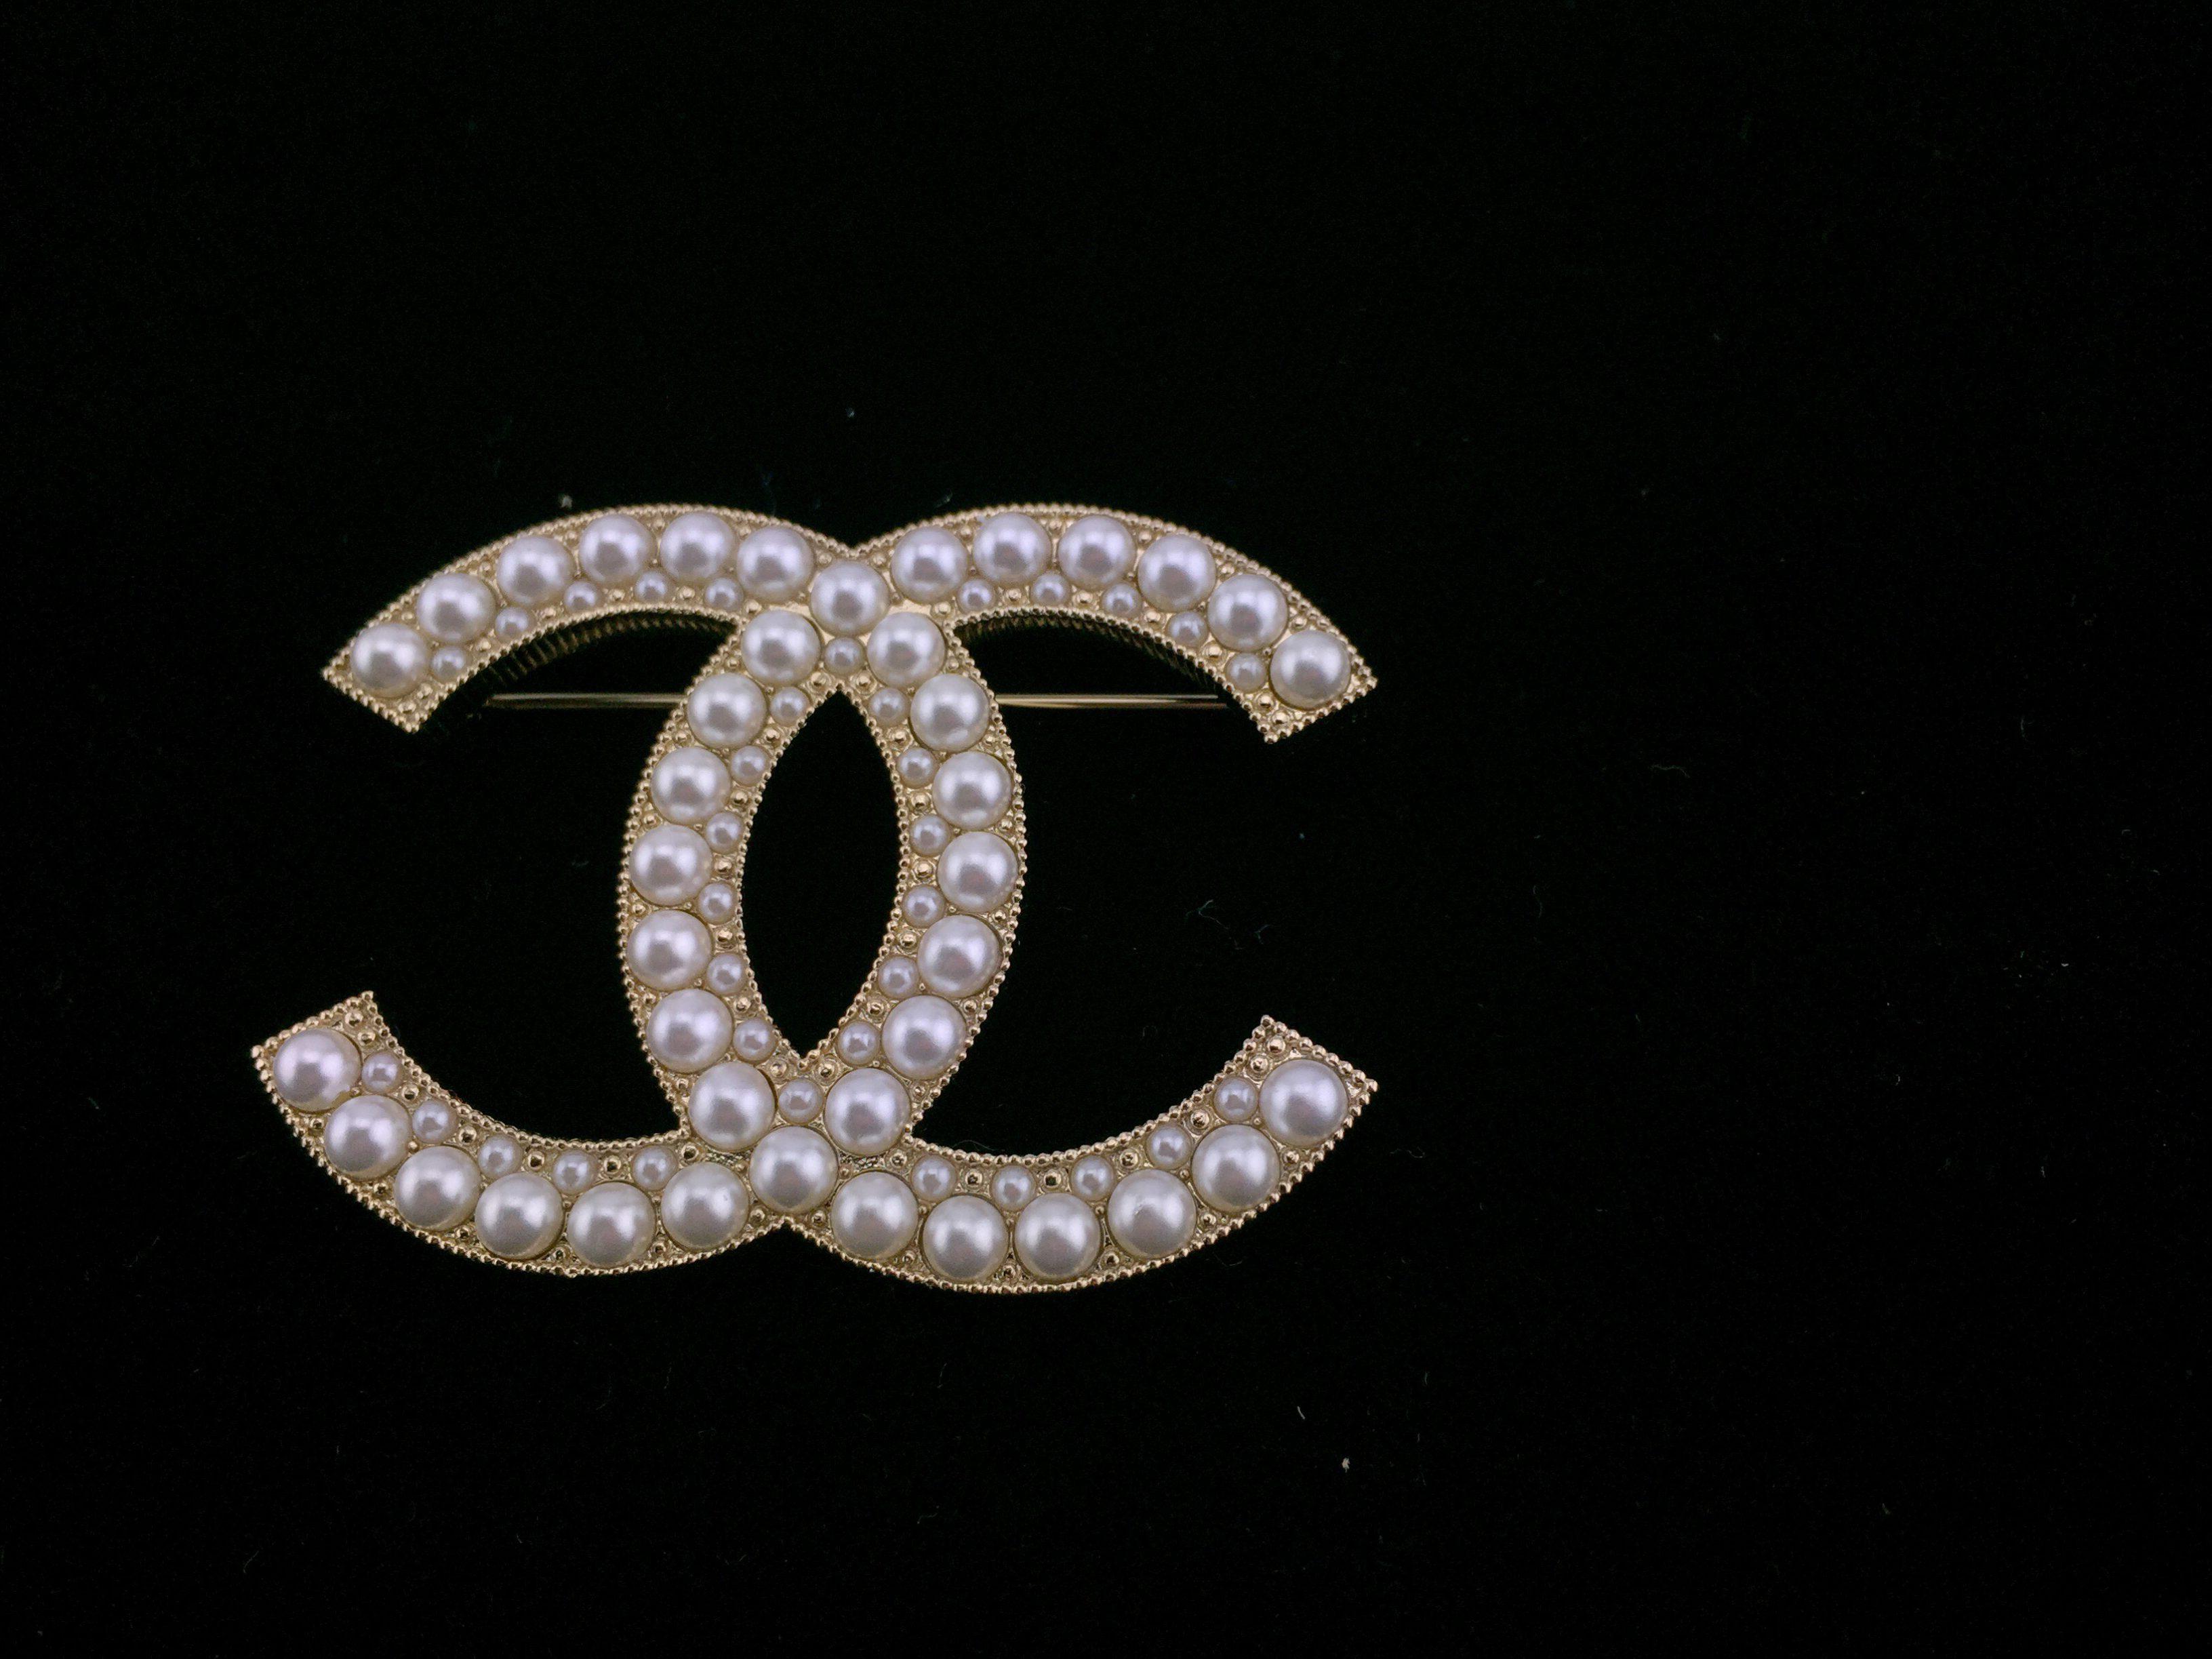 e1f249dd123 Gold Pearl Brooch Inspired